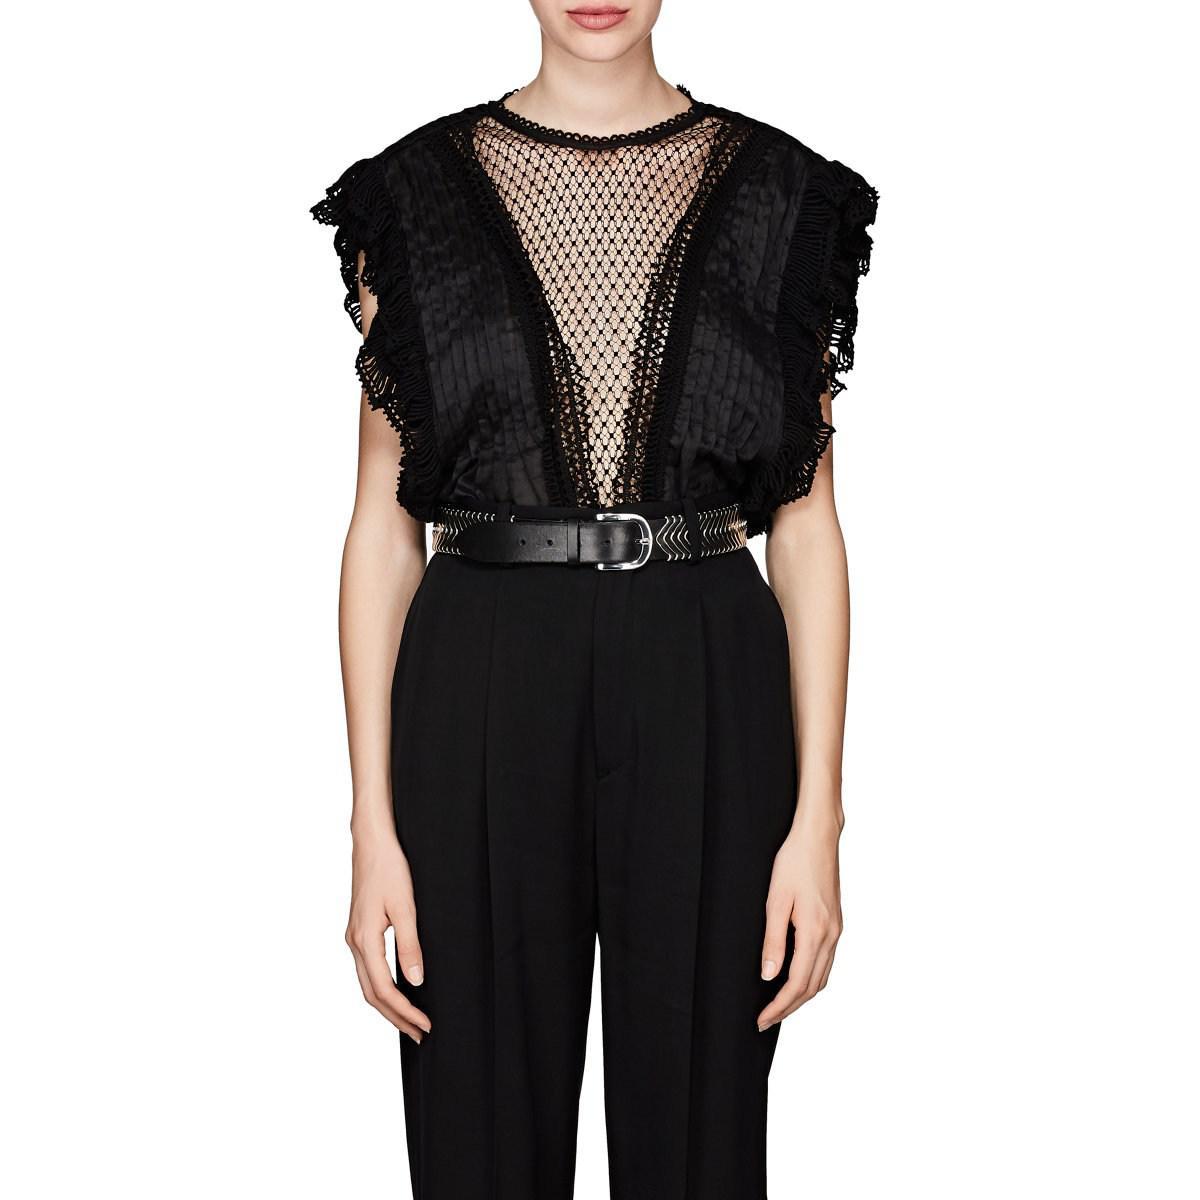 3f1f1fc251728e Isabel Marant. Women's Black Roya Organza Blouse. $825 From Barneys New York